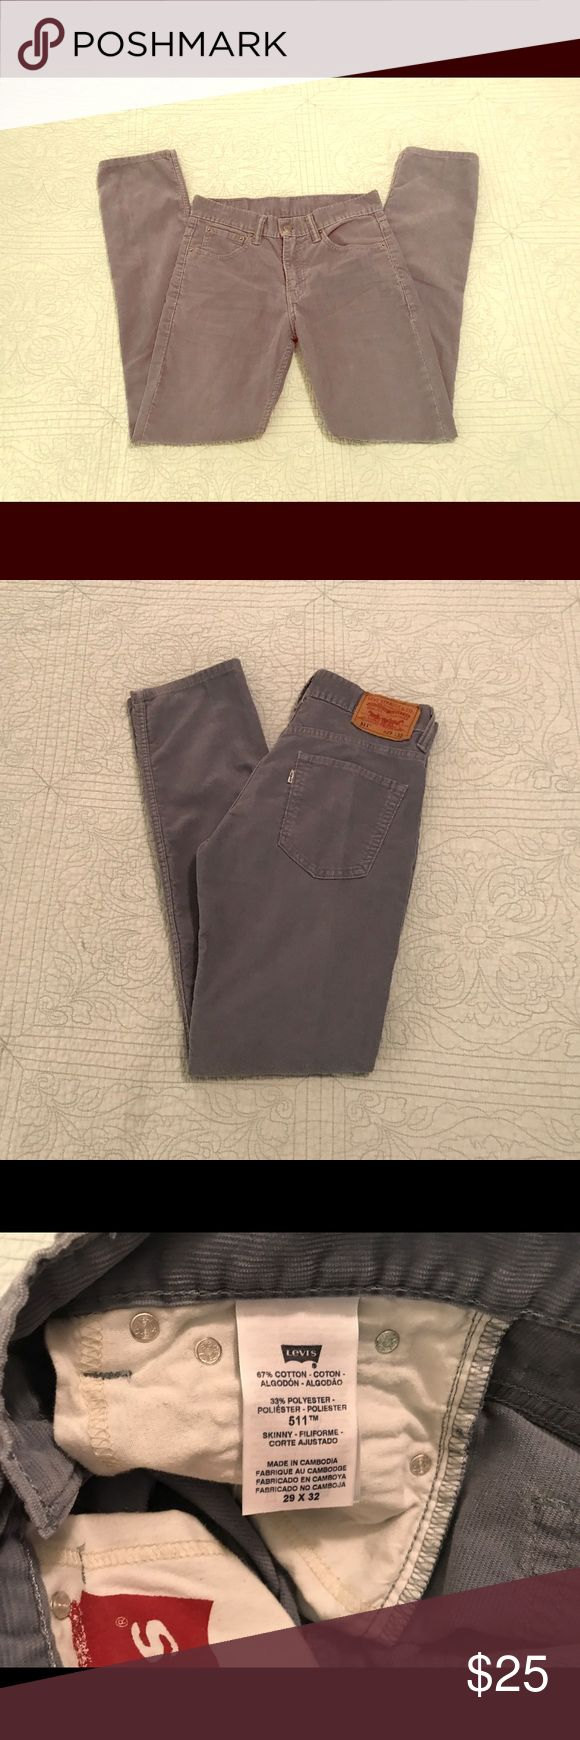 Levi's 511 Men's Gray Corduroy Pants EUC. Men's Gray Corduroy Skinny Pants. Size 28/32. Levi's Pants Corduroy